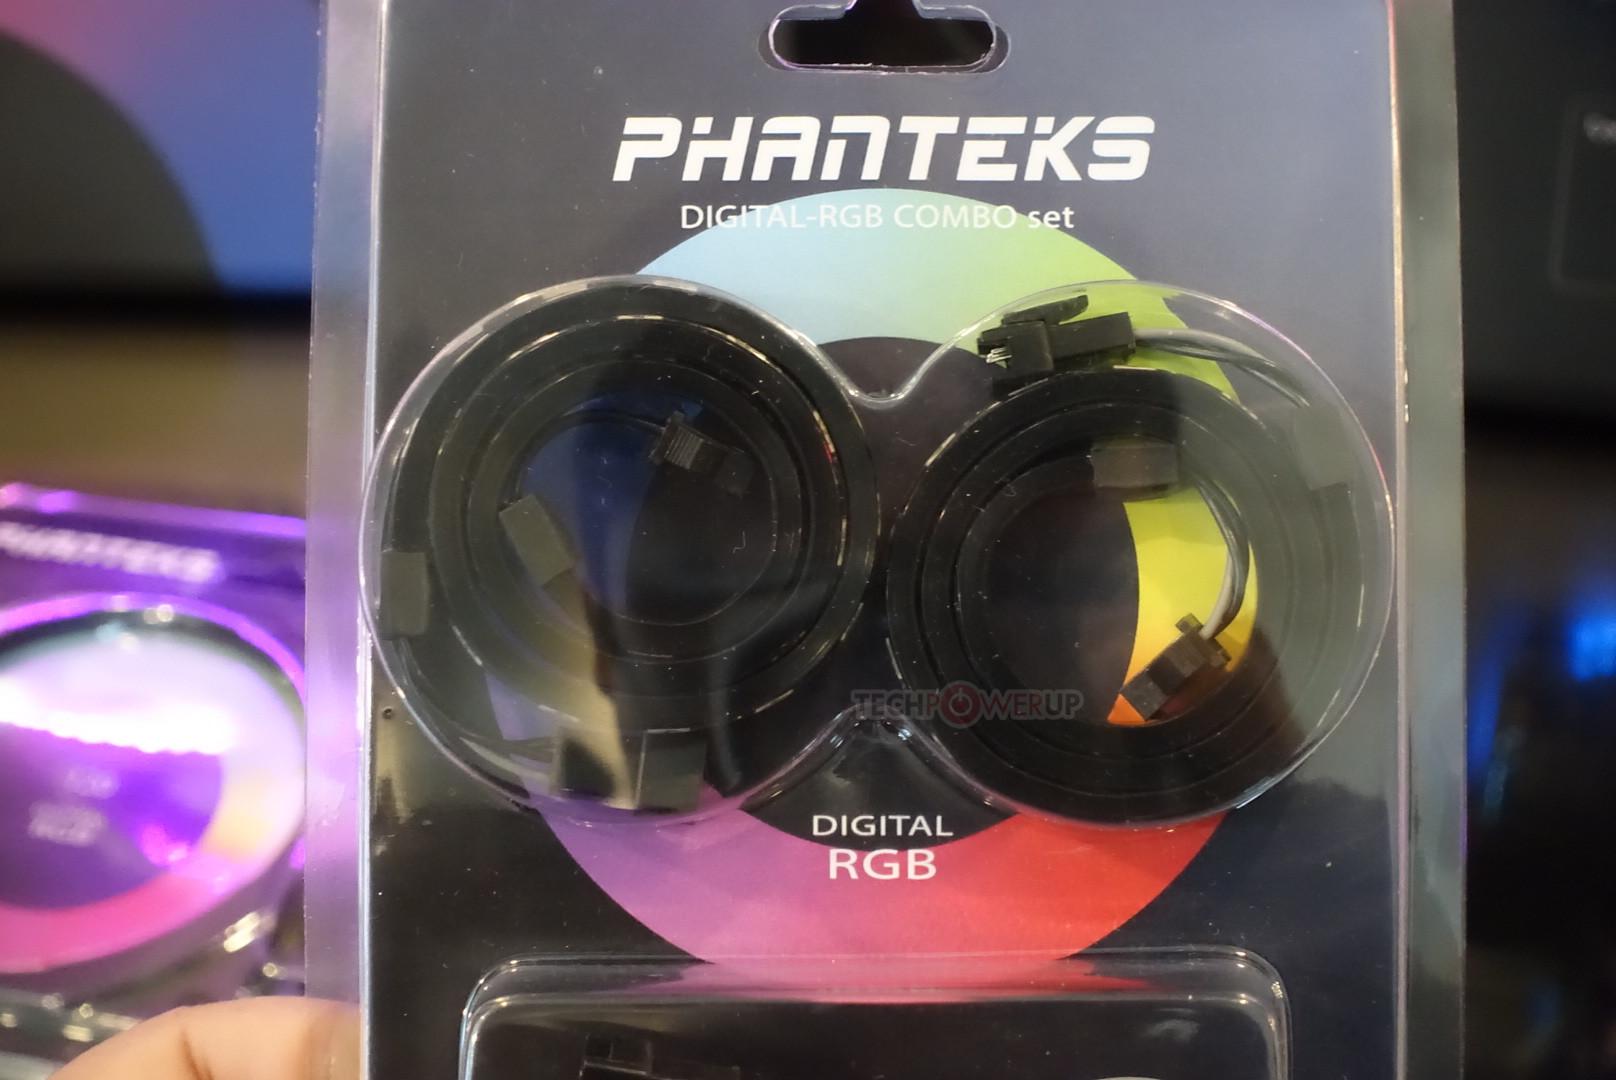 Phanteks' Four New RGB LED Products Dazzle | TechPowerUp